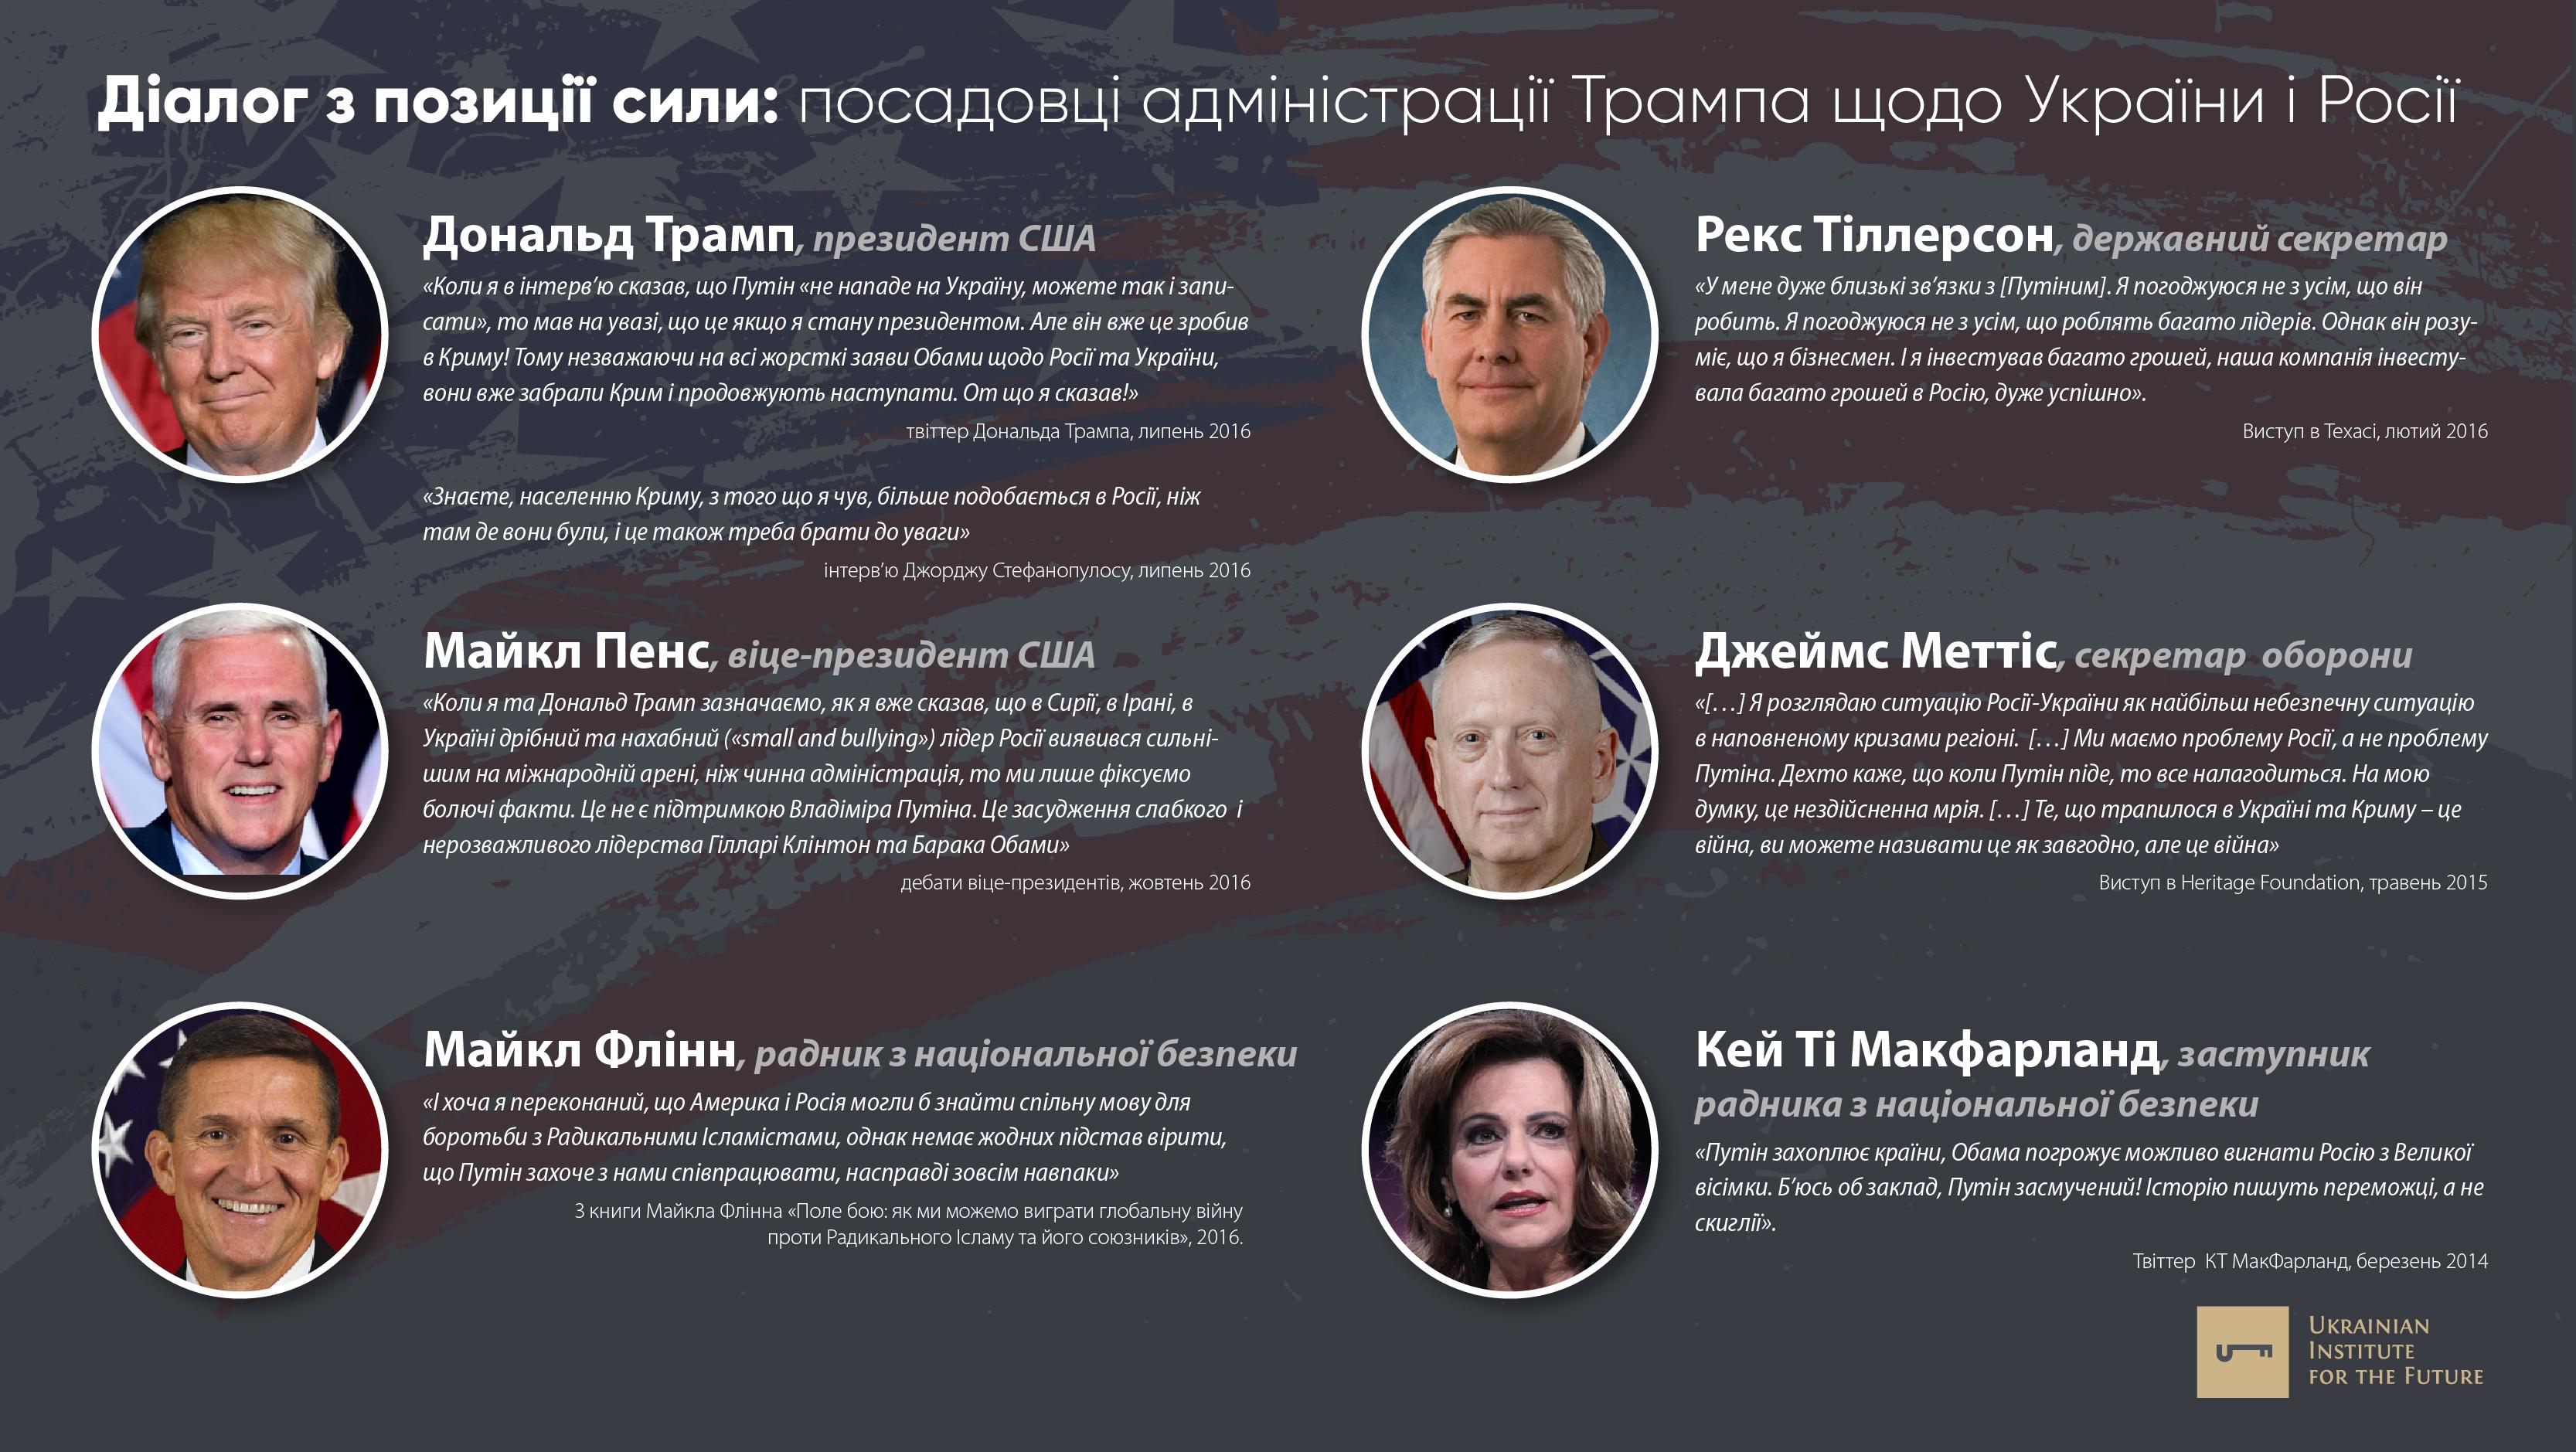 Посадовці адміністрації Трампа щодо України і Росії